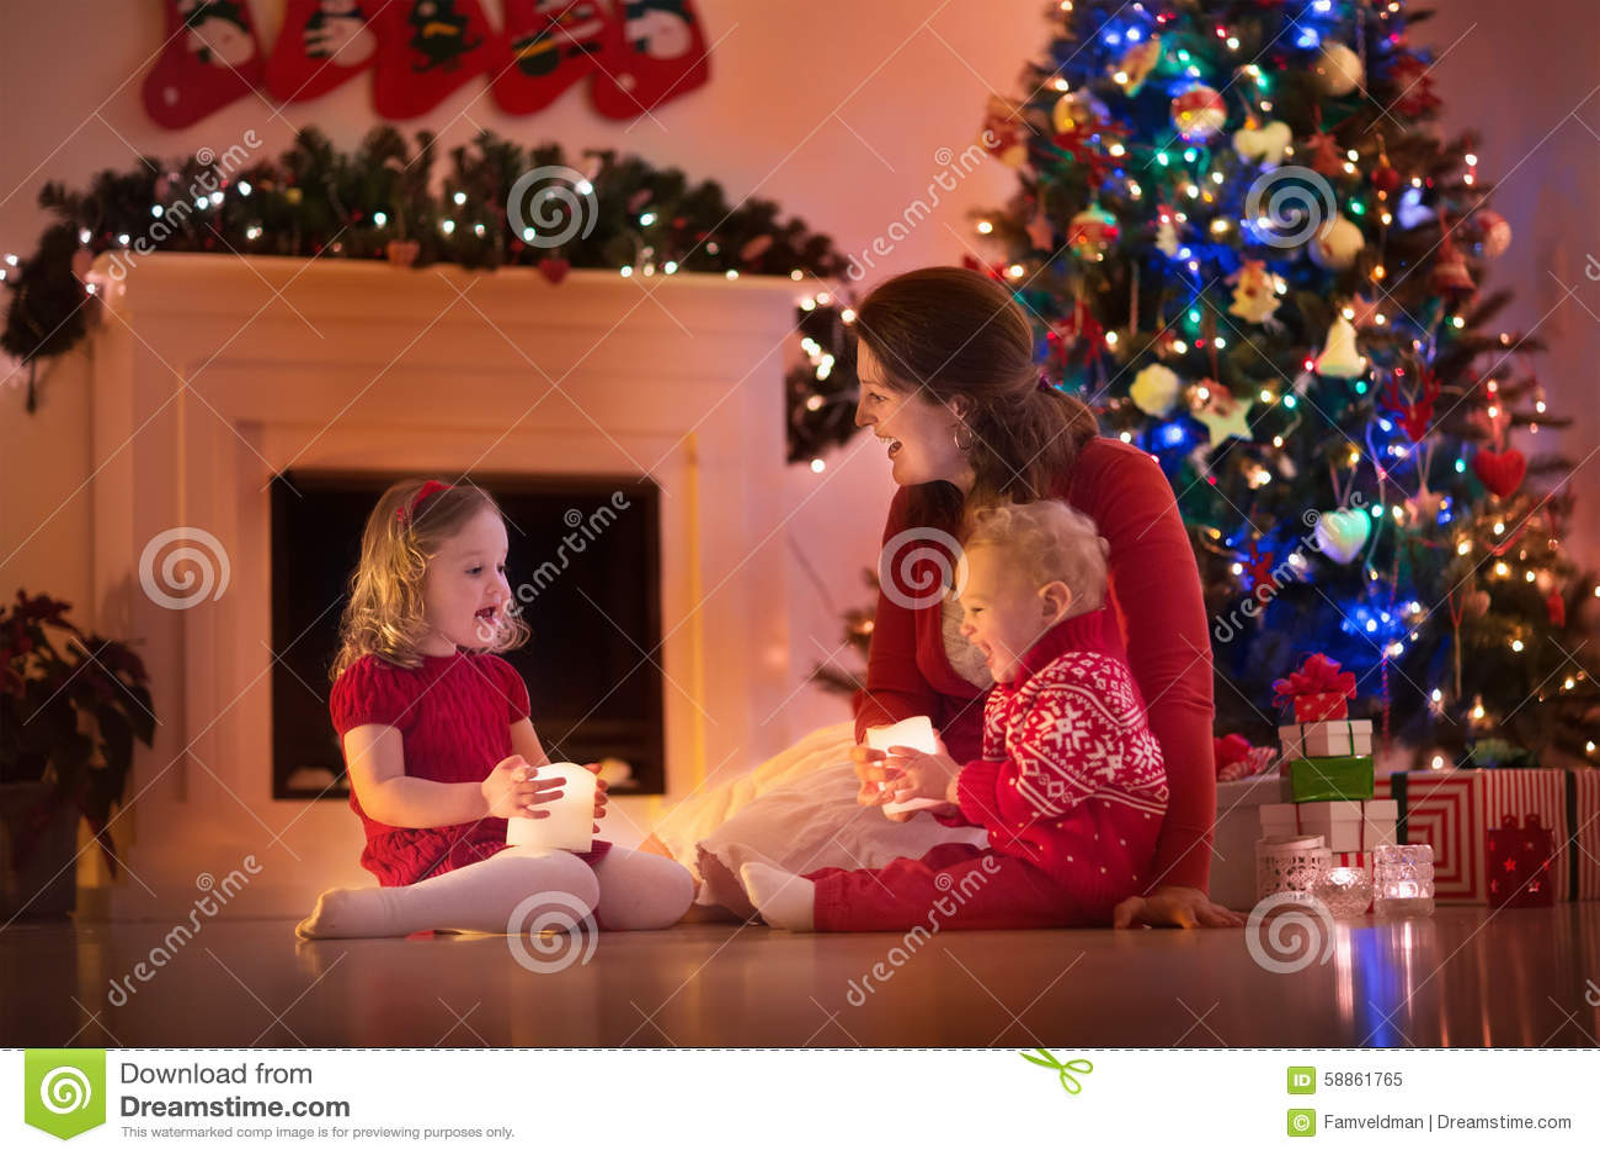 Light Up Christmas Gift Boxes